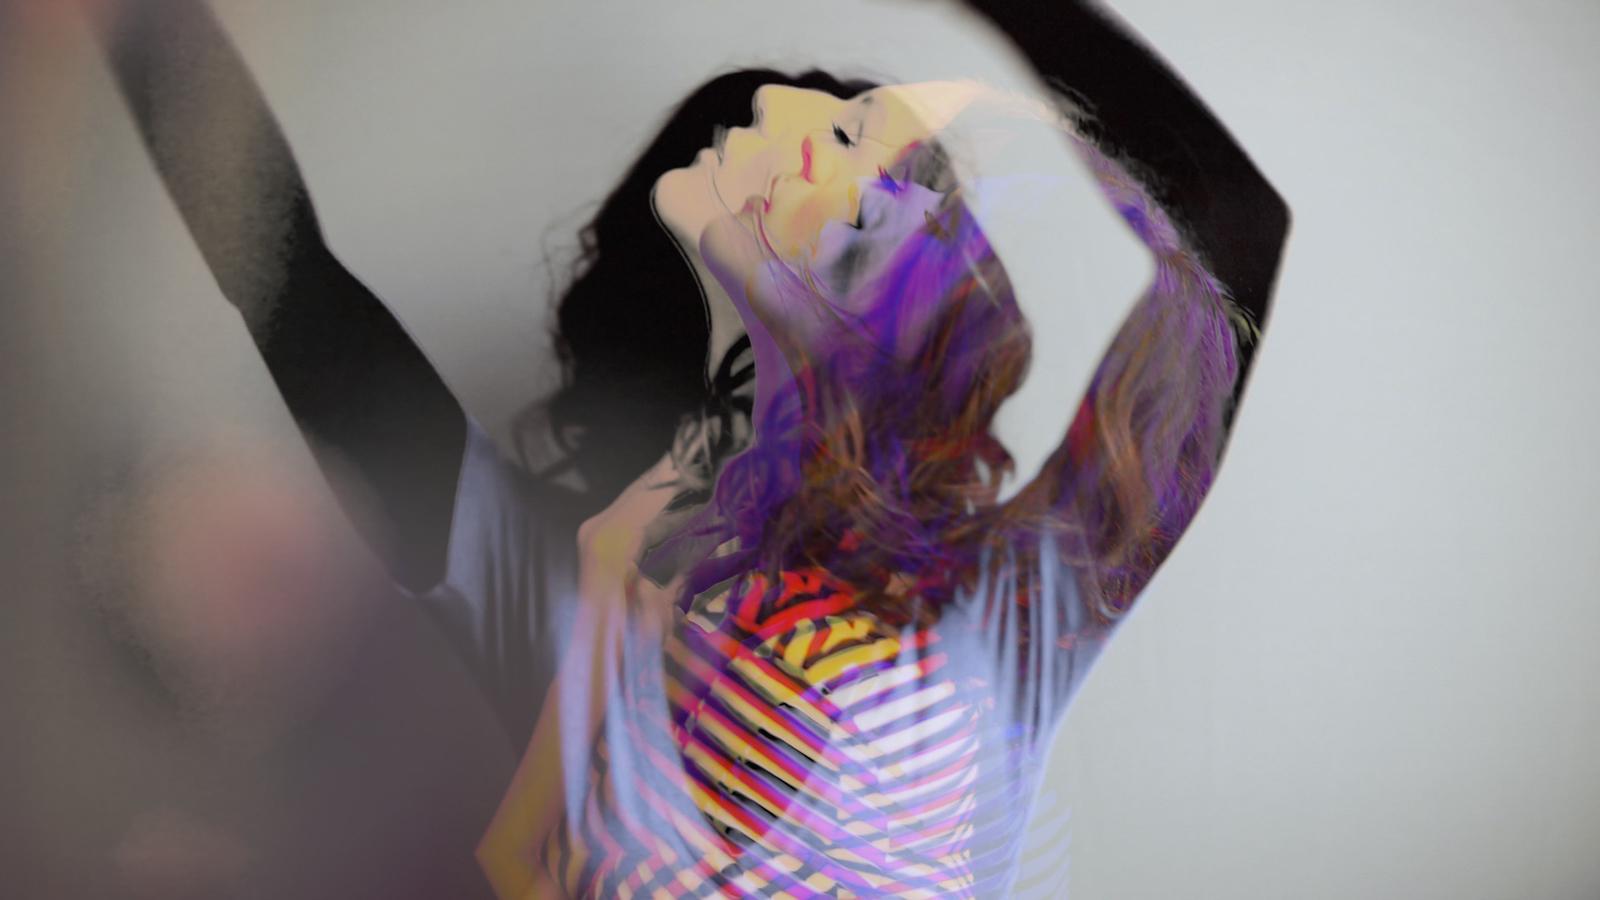 Distorted Memories Video Stills